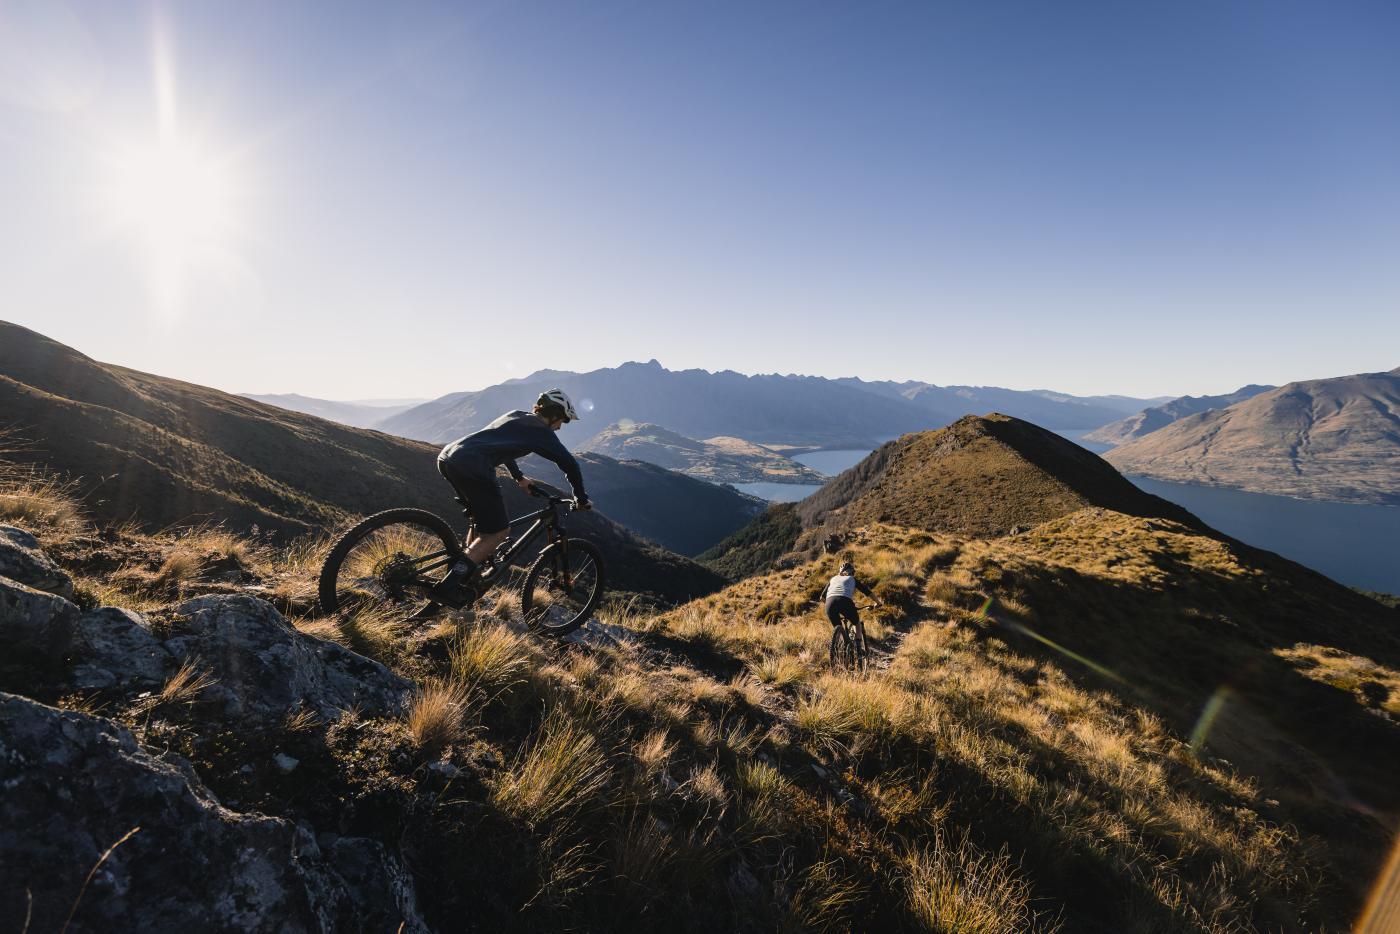 E-Bike Mountain Biking, Ben Lomond